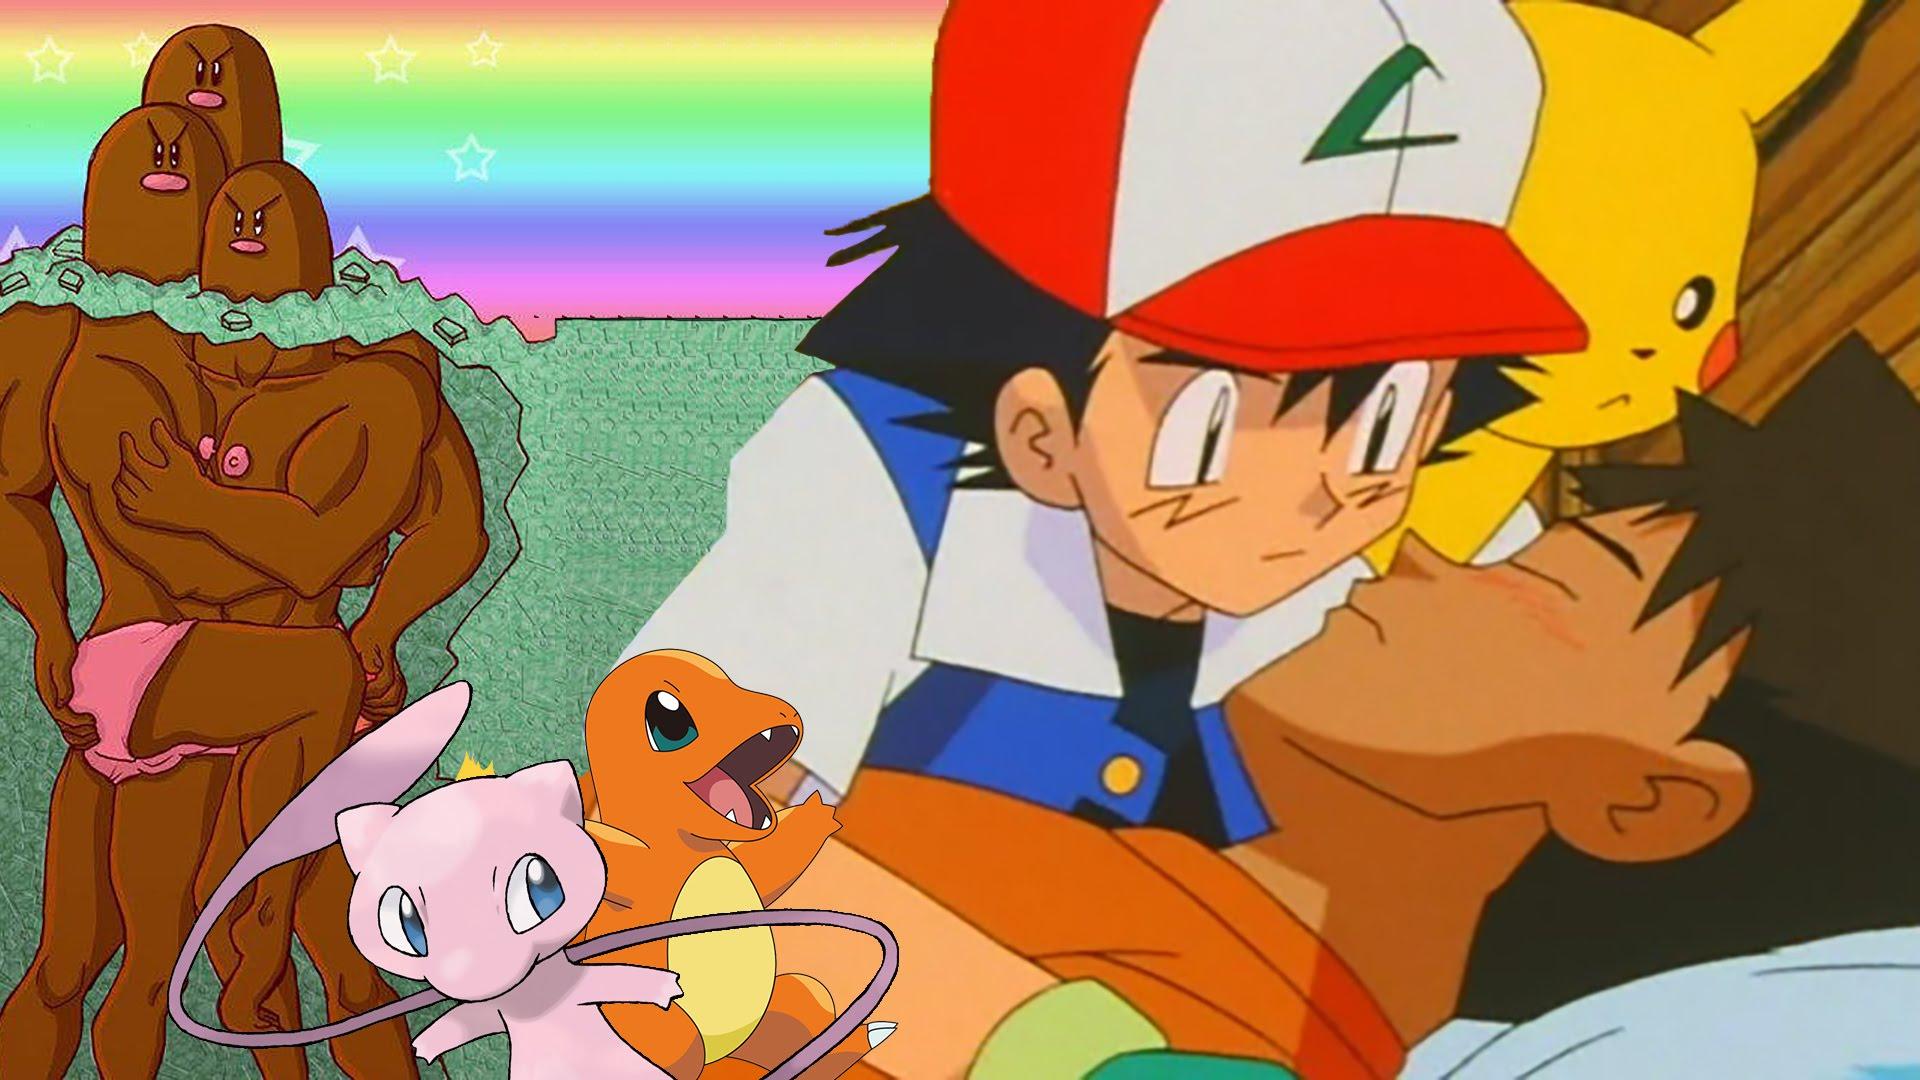 Porn richie pokemon ash and